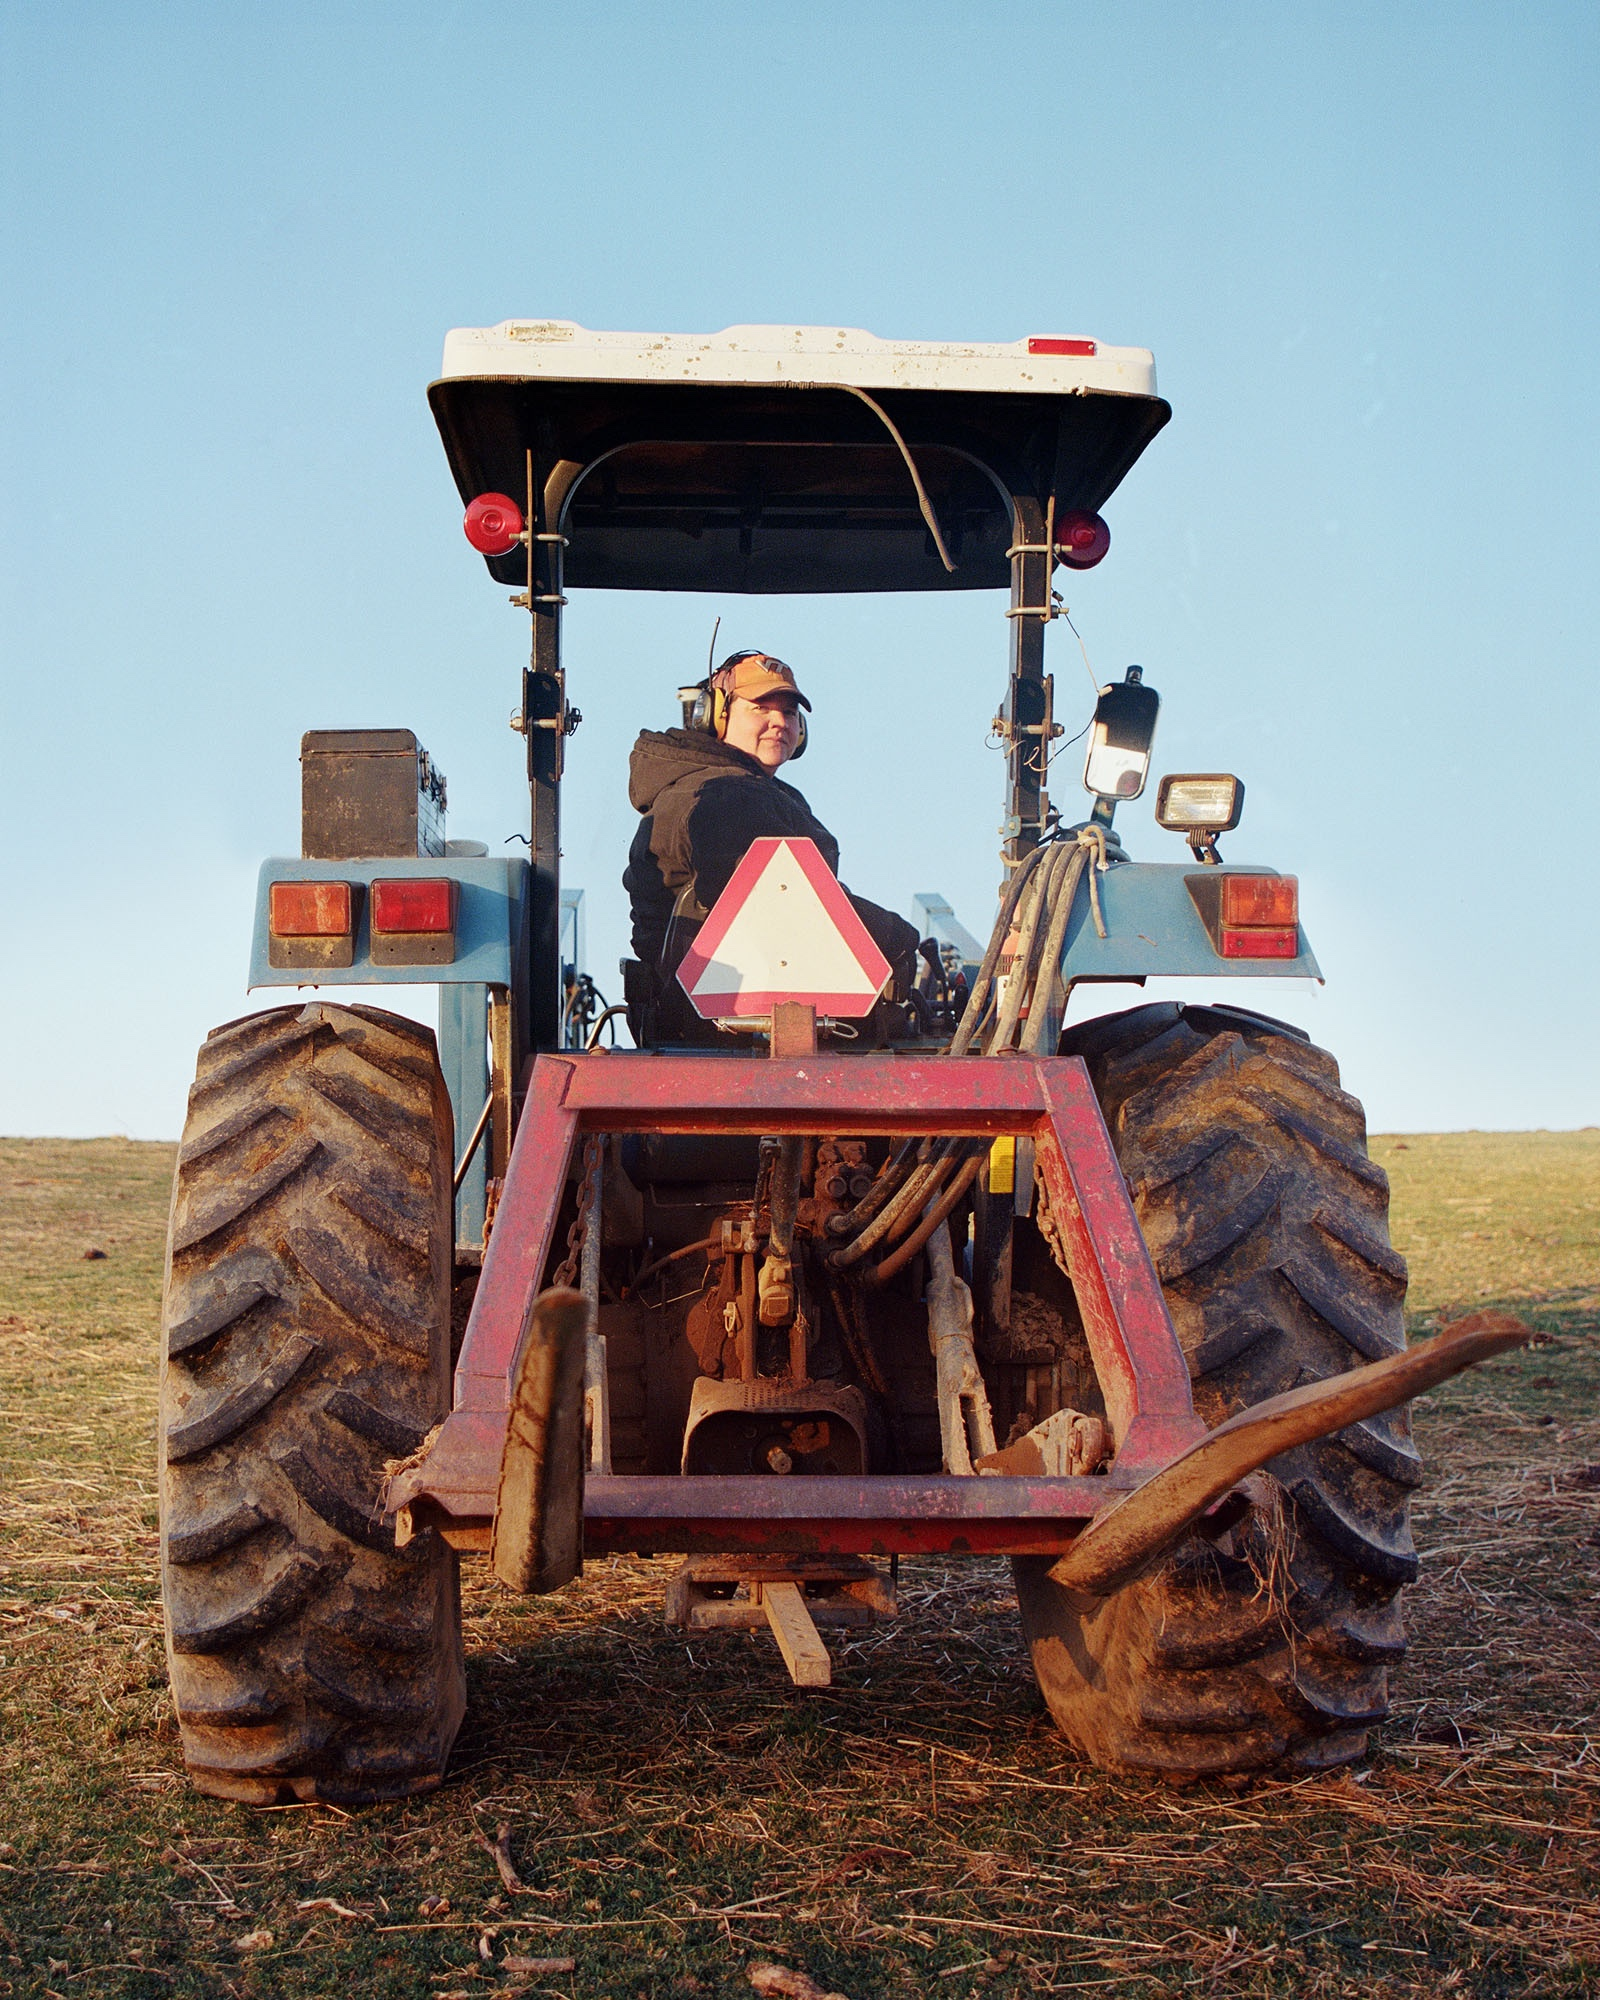 Laura in her Tractor